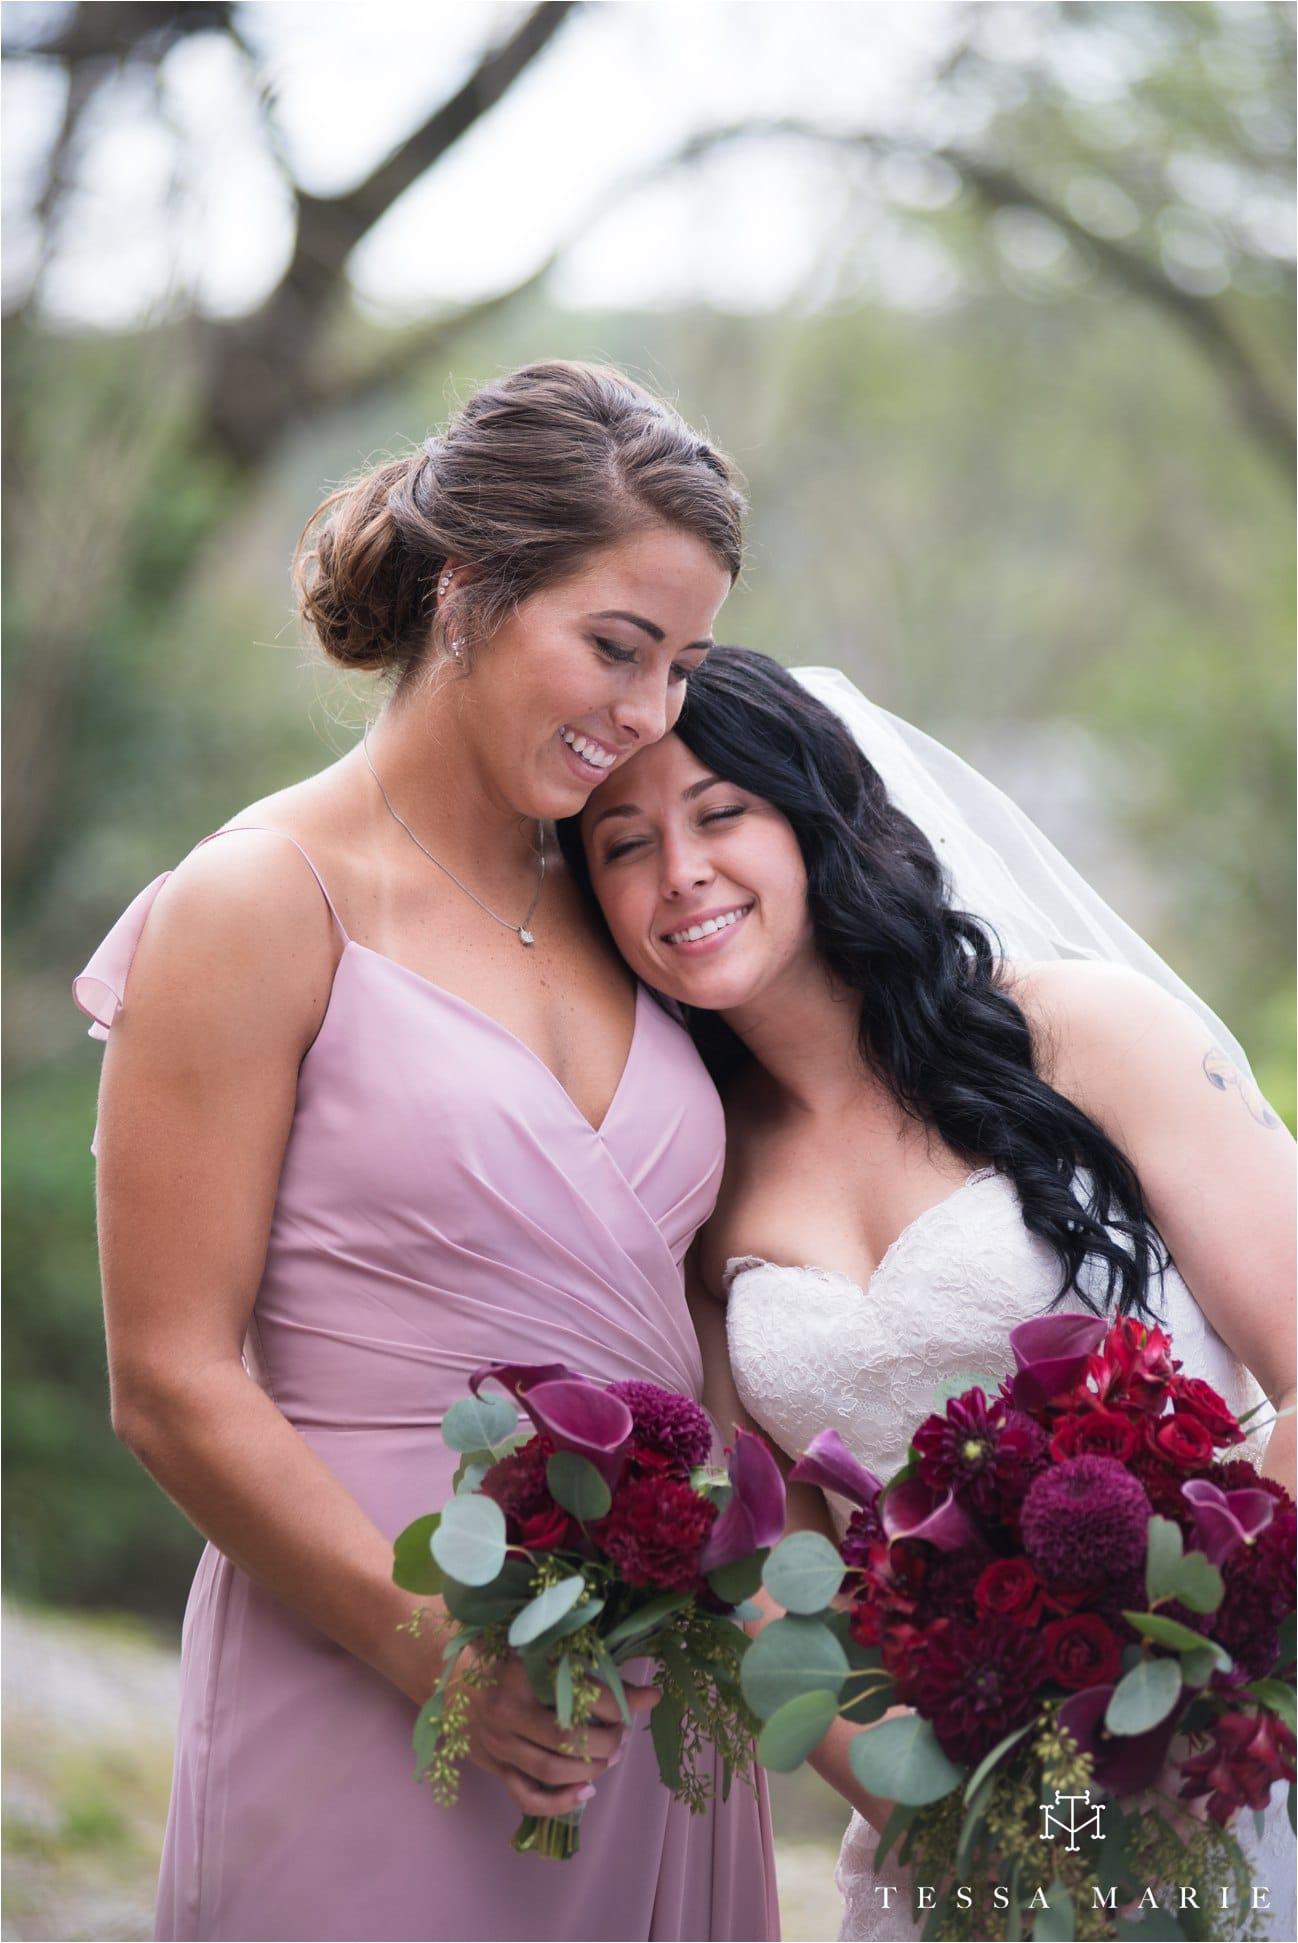 tessa_marie_weddings_rivermill_event_centere_candid_outdoor_wedding_photos_0067